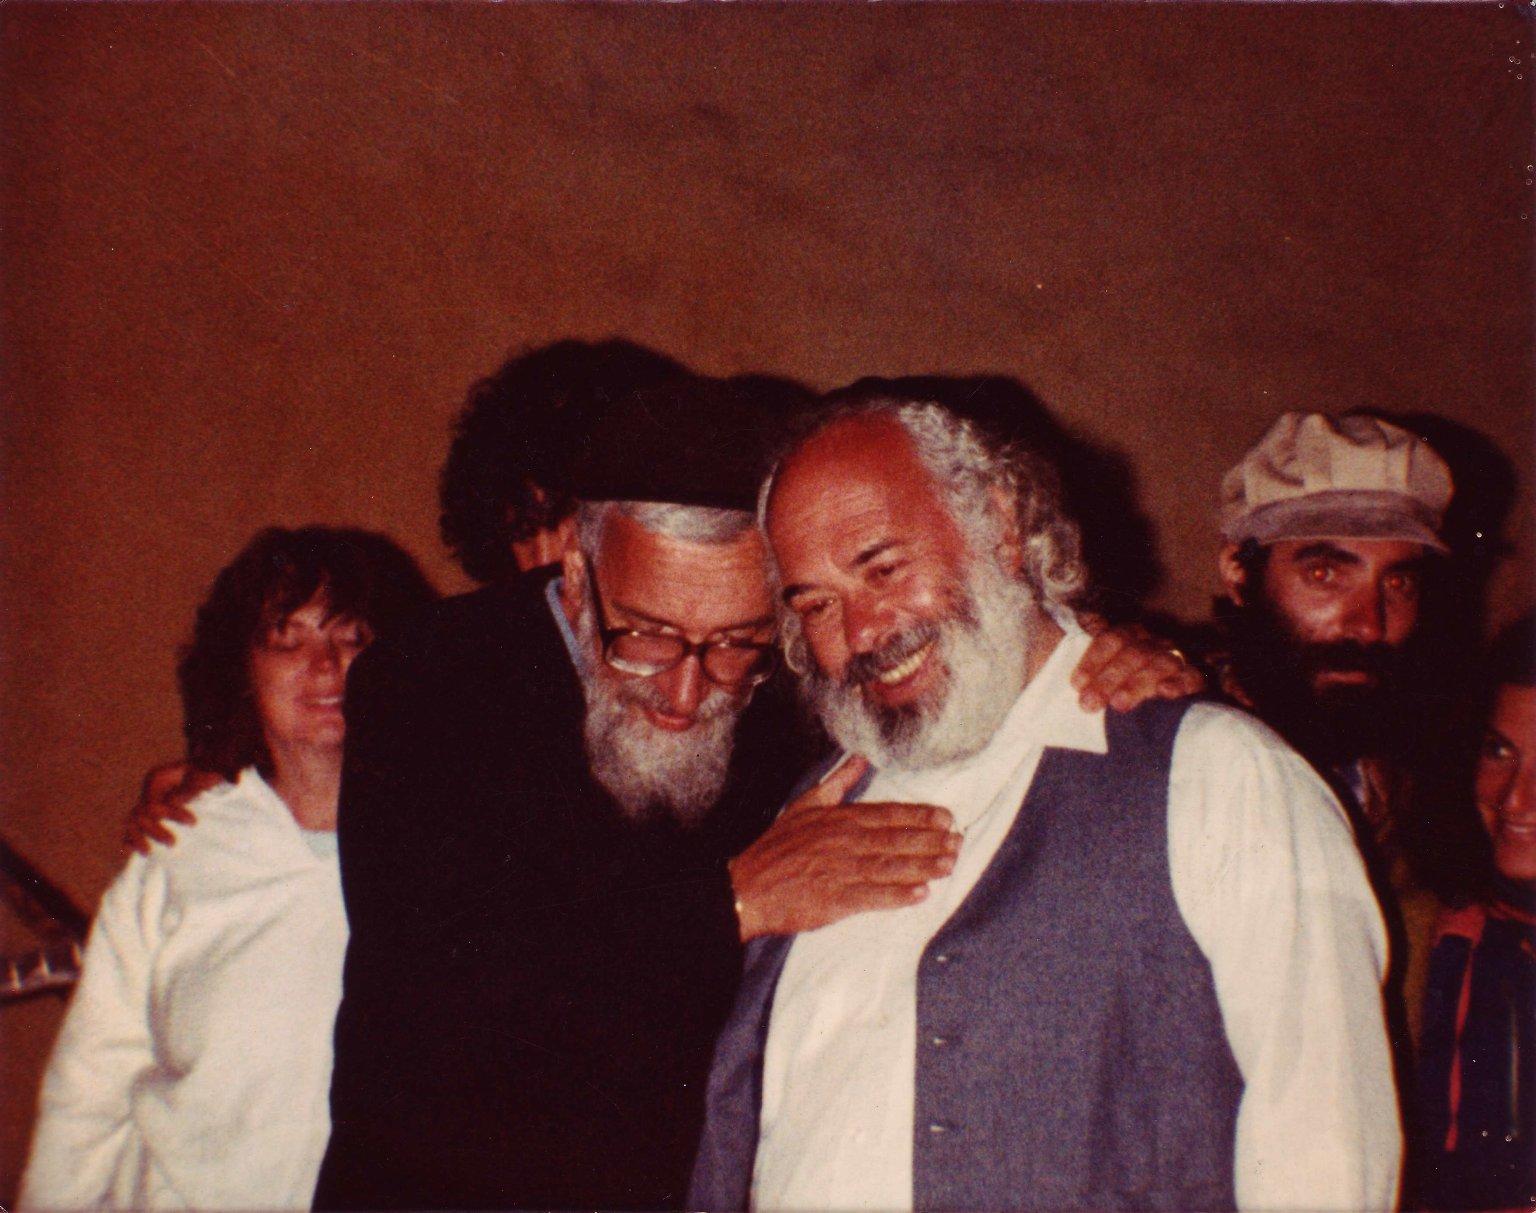 Rabbi Zalman Schachter-Shalomi with his hand on the chest of Rabbi Shlomo Carlebach in Berkeley, California, 1988.